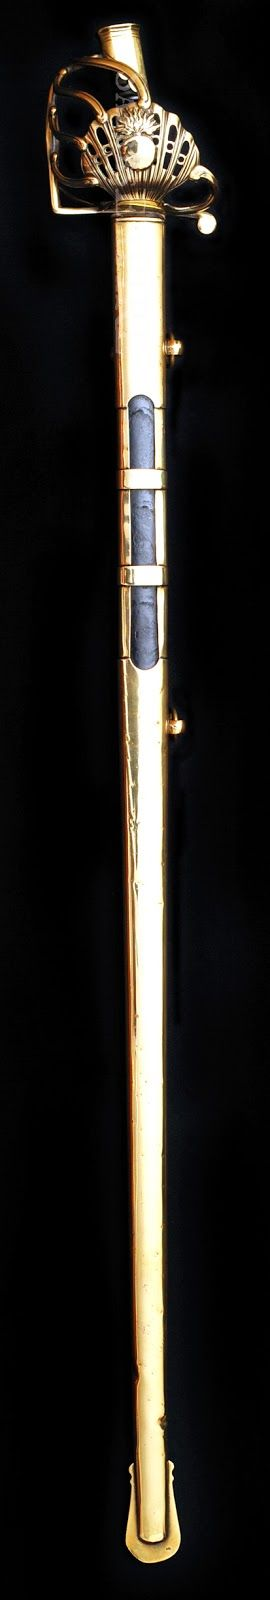 Collection de Sabres et Epées des Guerres Napoléoniennes: Sabre Officier de Grenadier à Cheval de la Garde